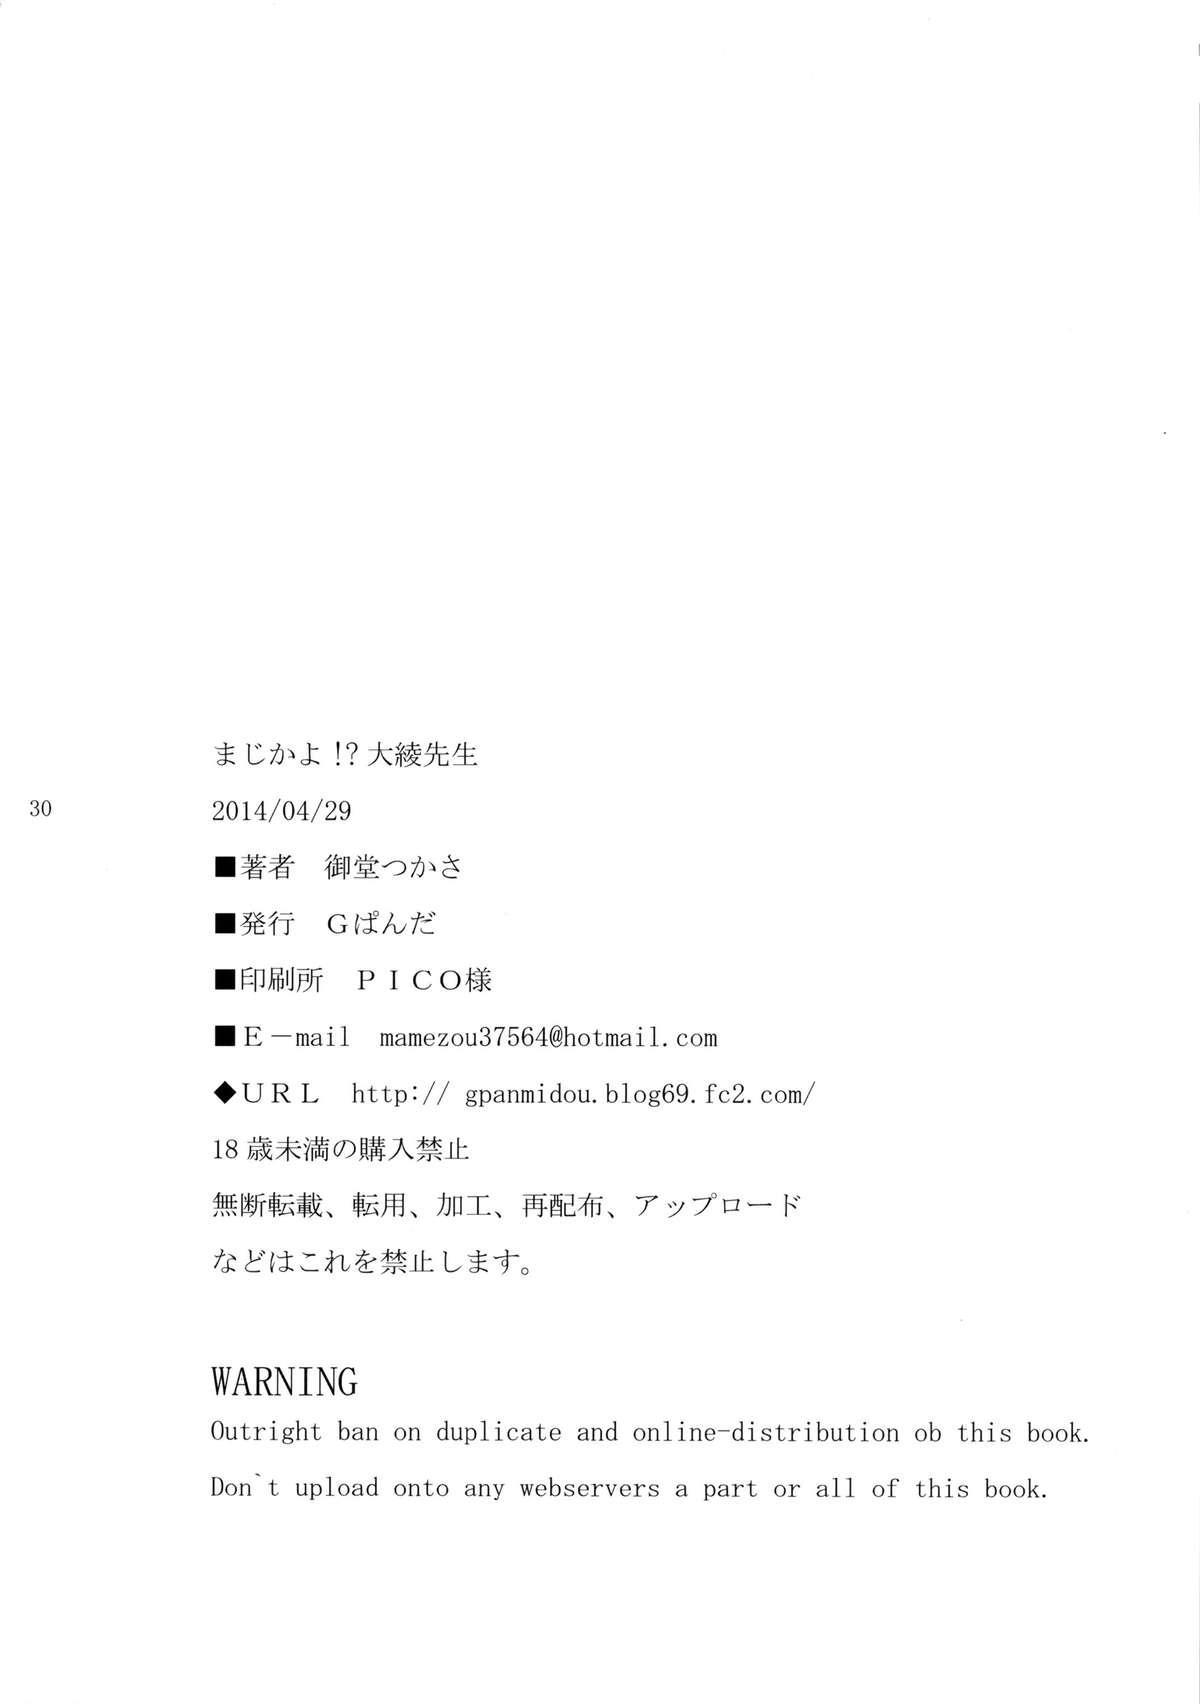 (COMIC1☆8) [G-panda (Midoh Tsukasa)] Maji kayo!? Ooaya-sensei   I Can't Believe It! Ooaya-sensei (Magical Taruruuto-kun) [English] {doujin-moe.us} 28